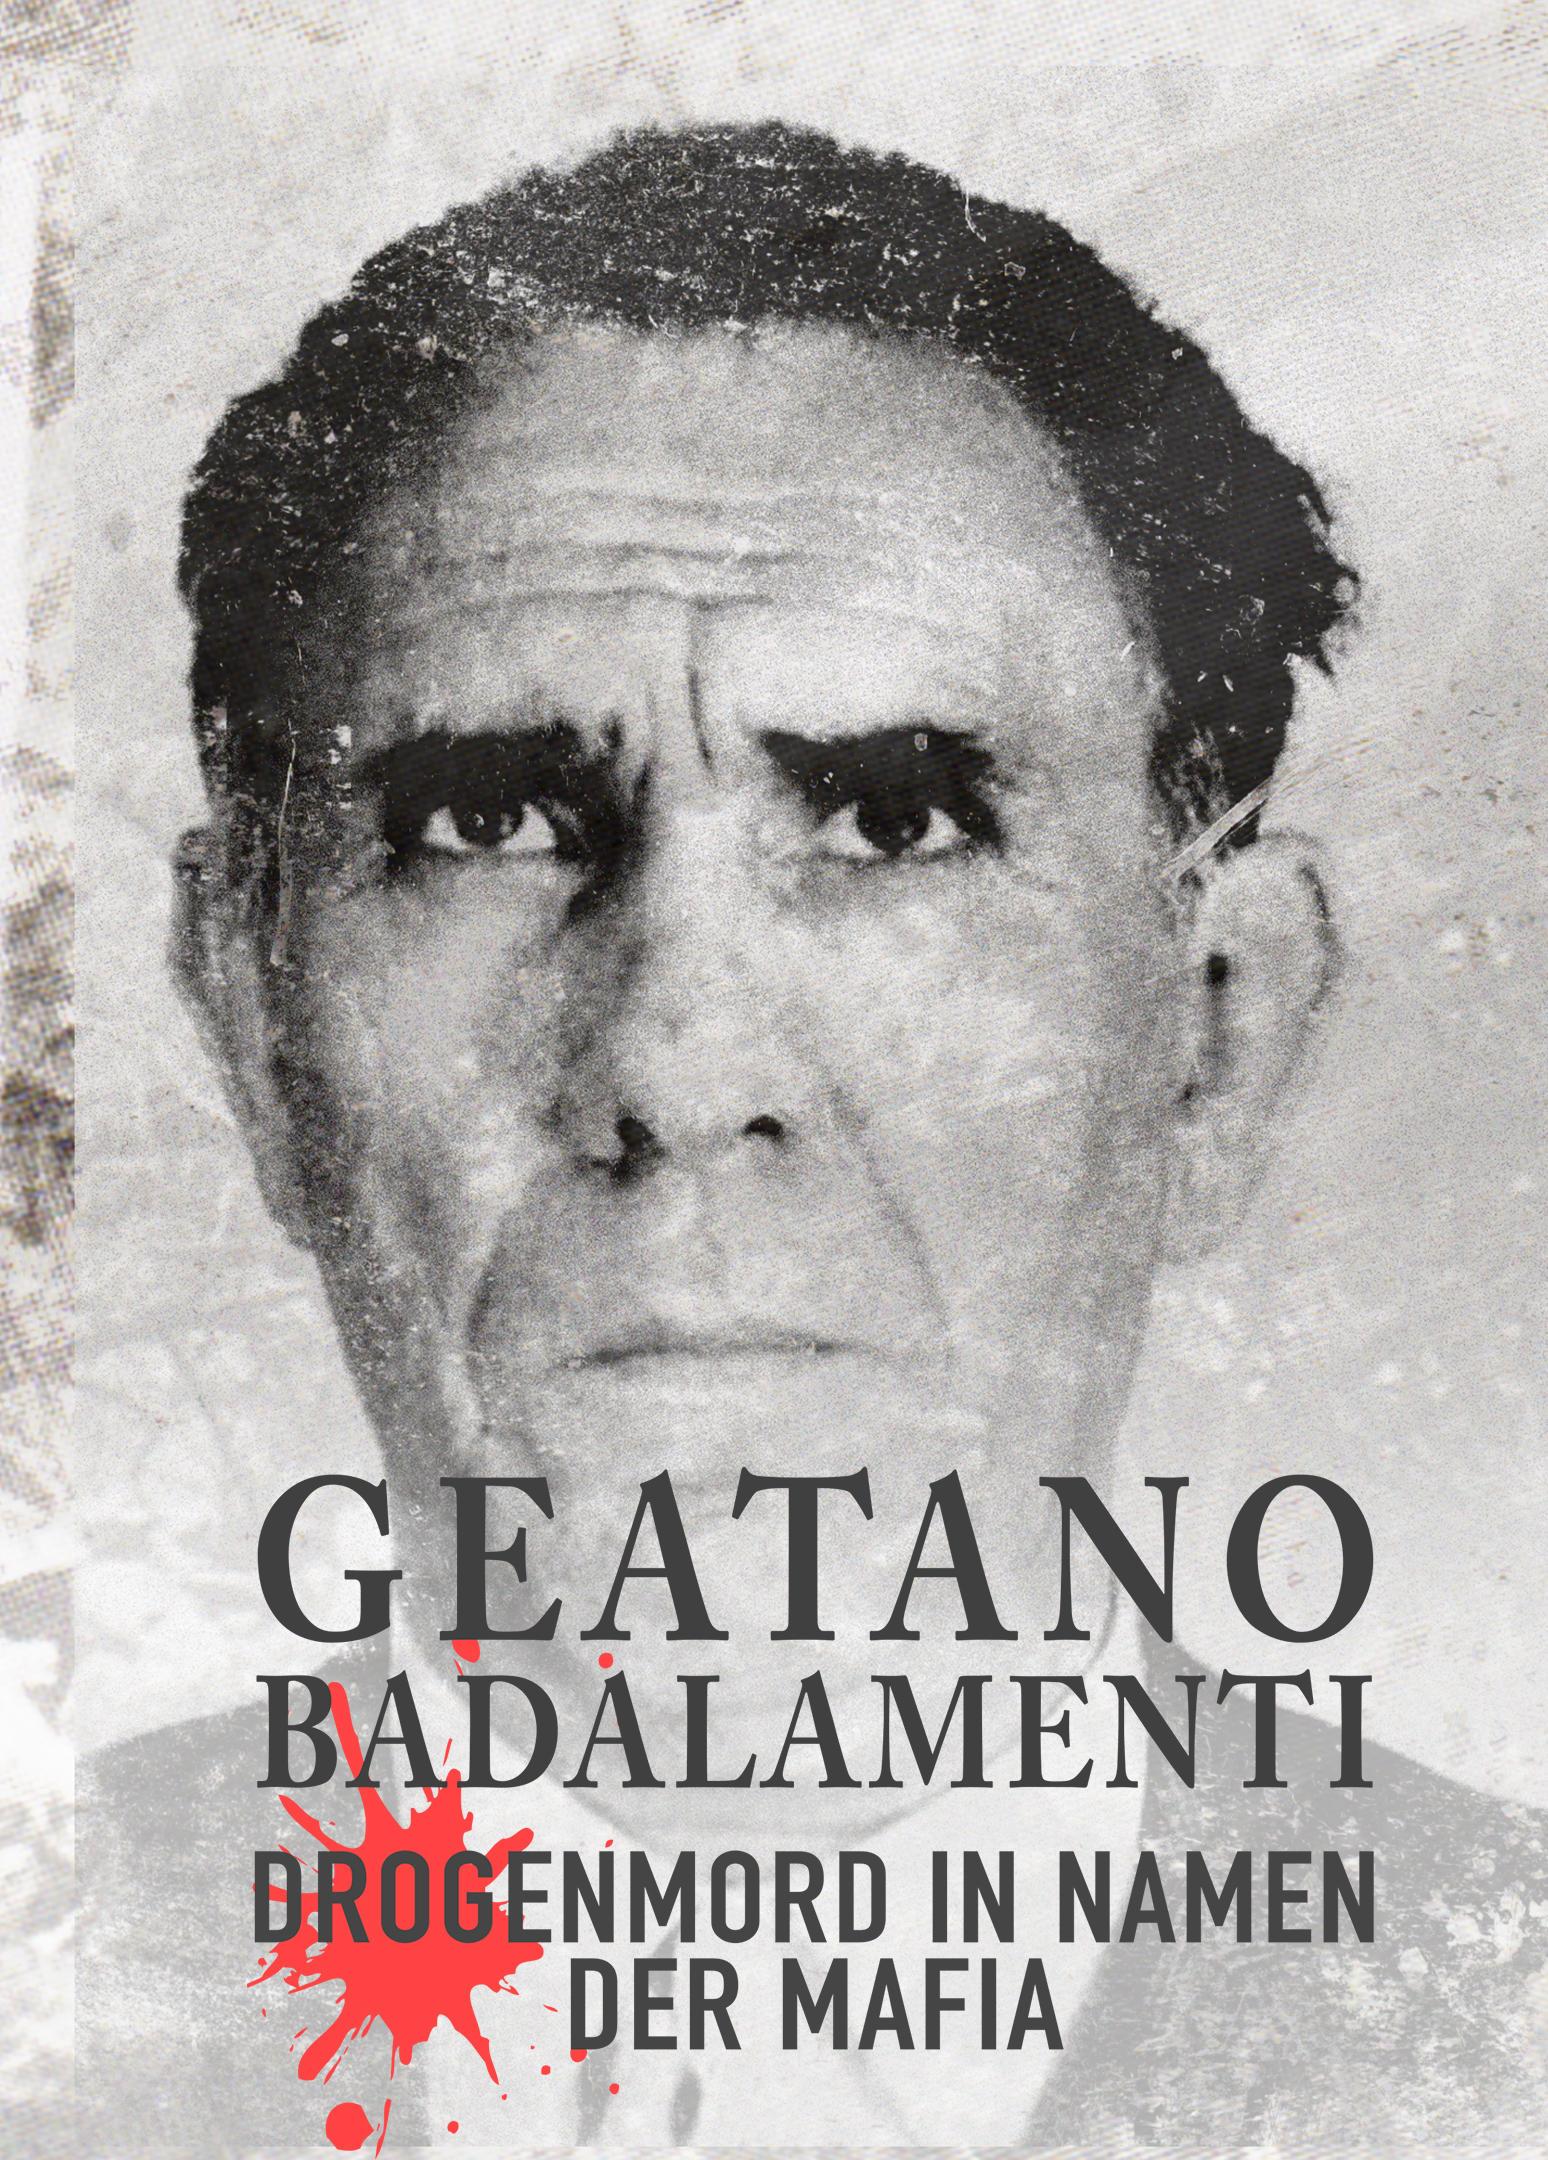 Gaetano Badalamenti: Drogenmord im Namen der Mafia